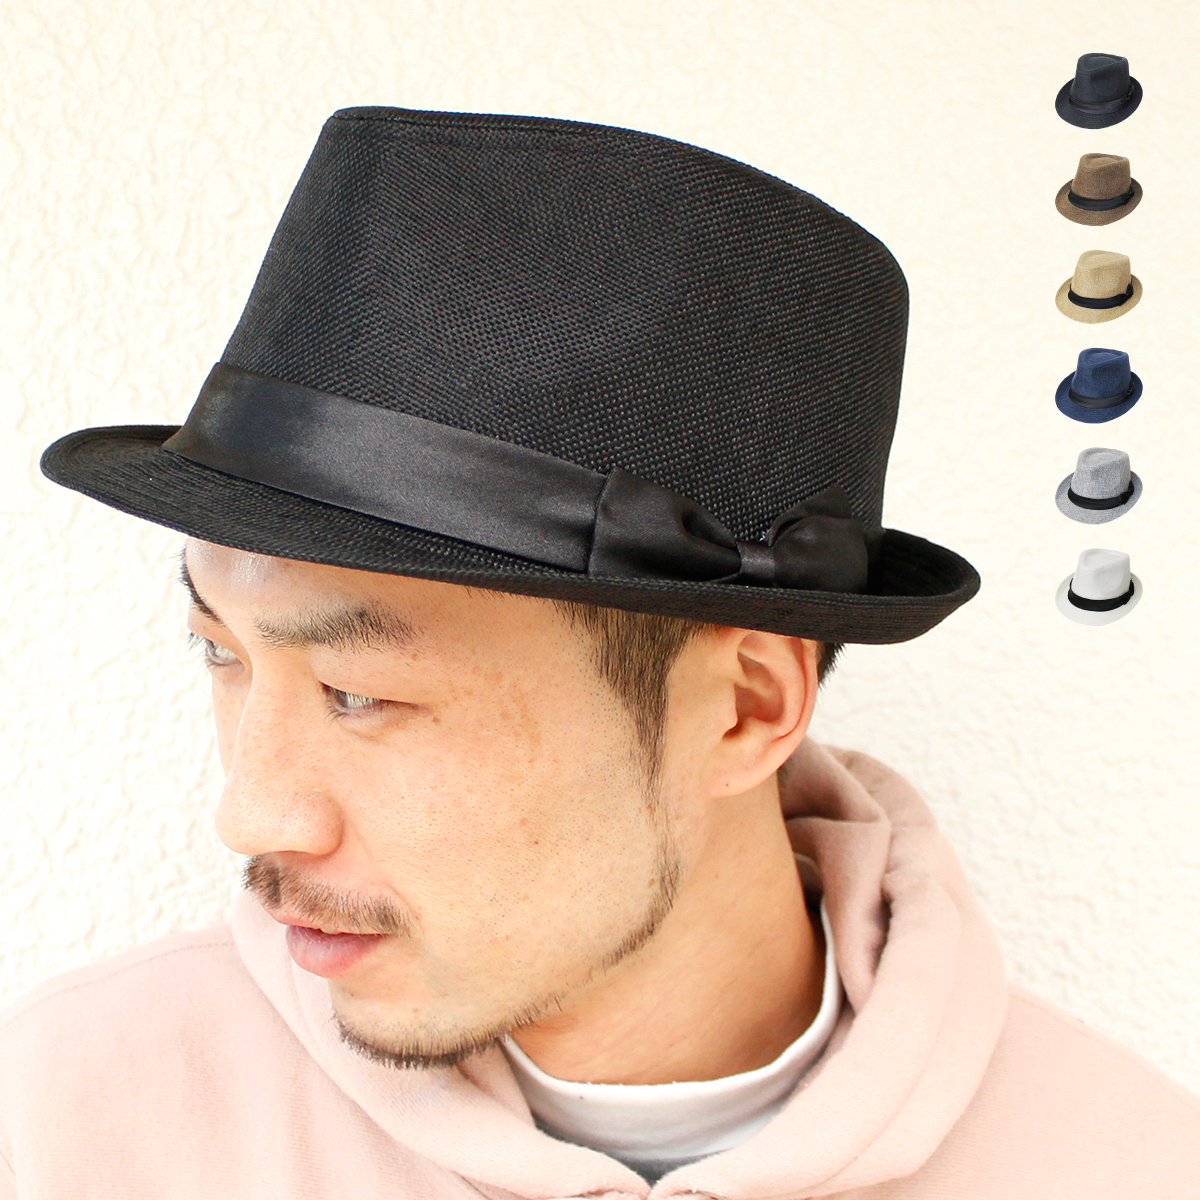 4df05c2e64e9a Hats and Caps River-Up: Hats and hat-caps & hats / simple ...